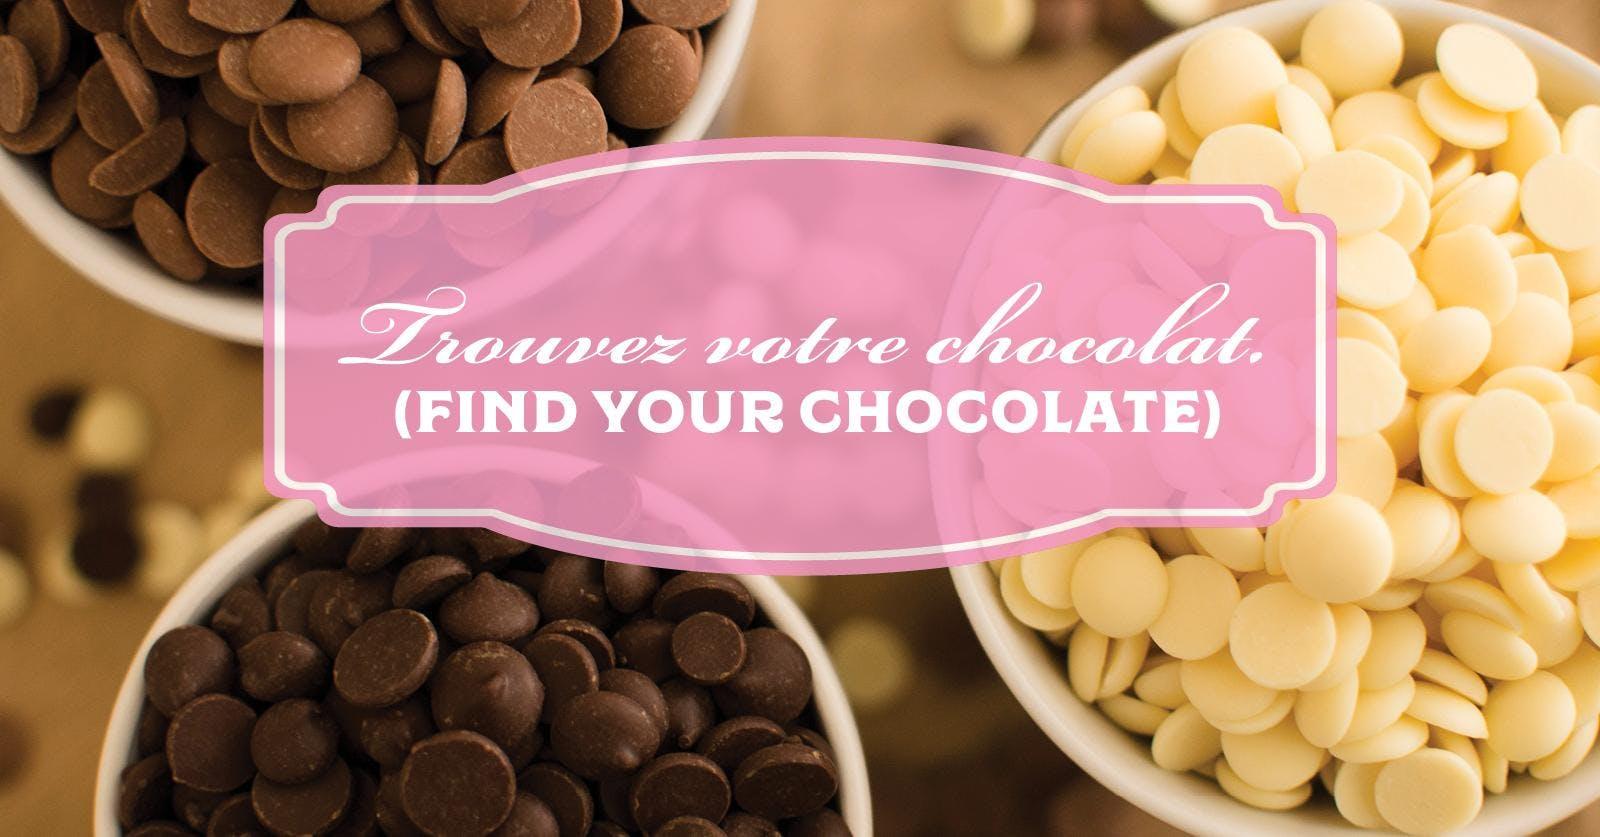 Trouves votre chocolat! (Find your Chocolate)